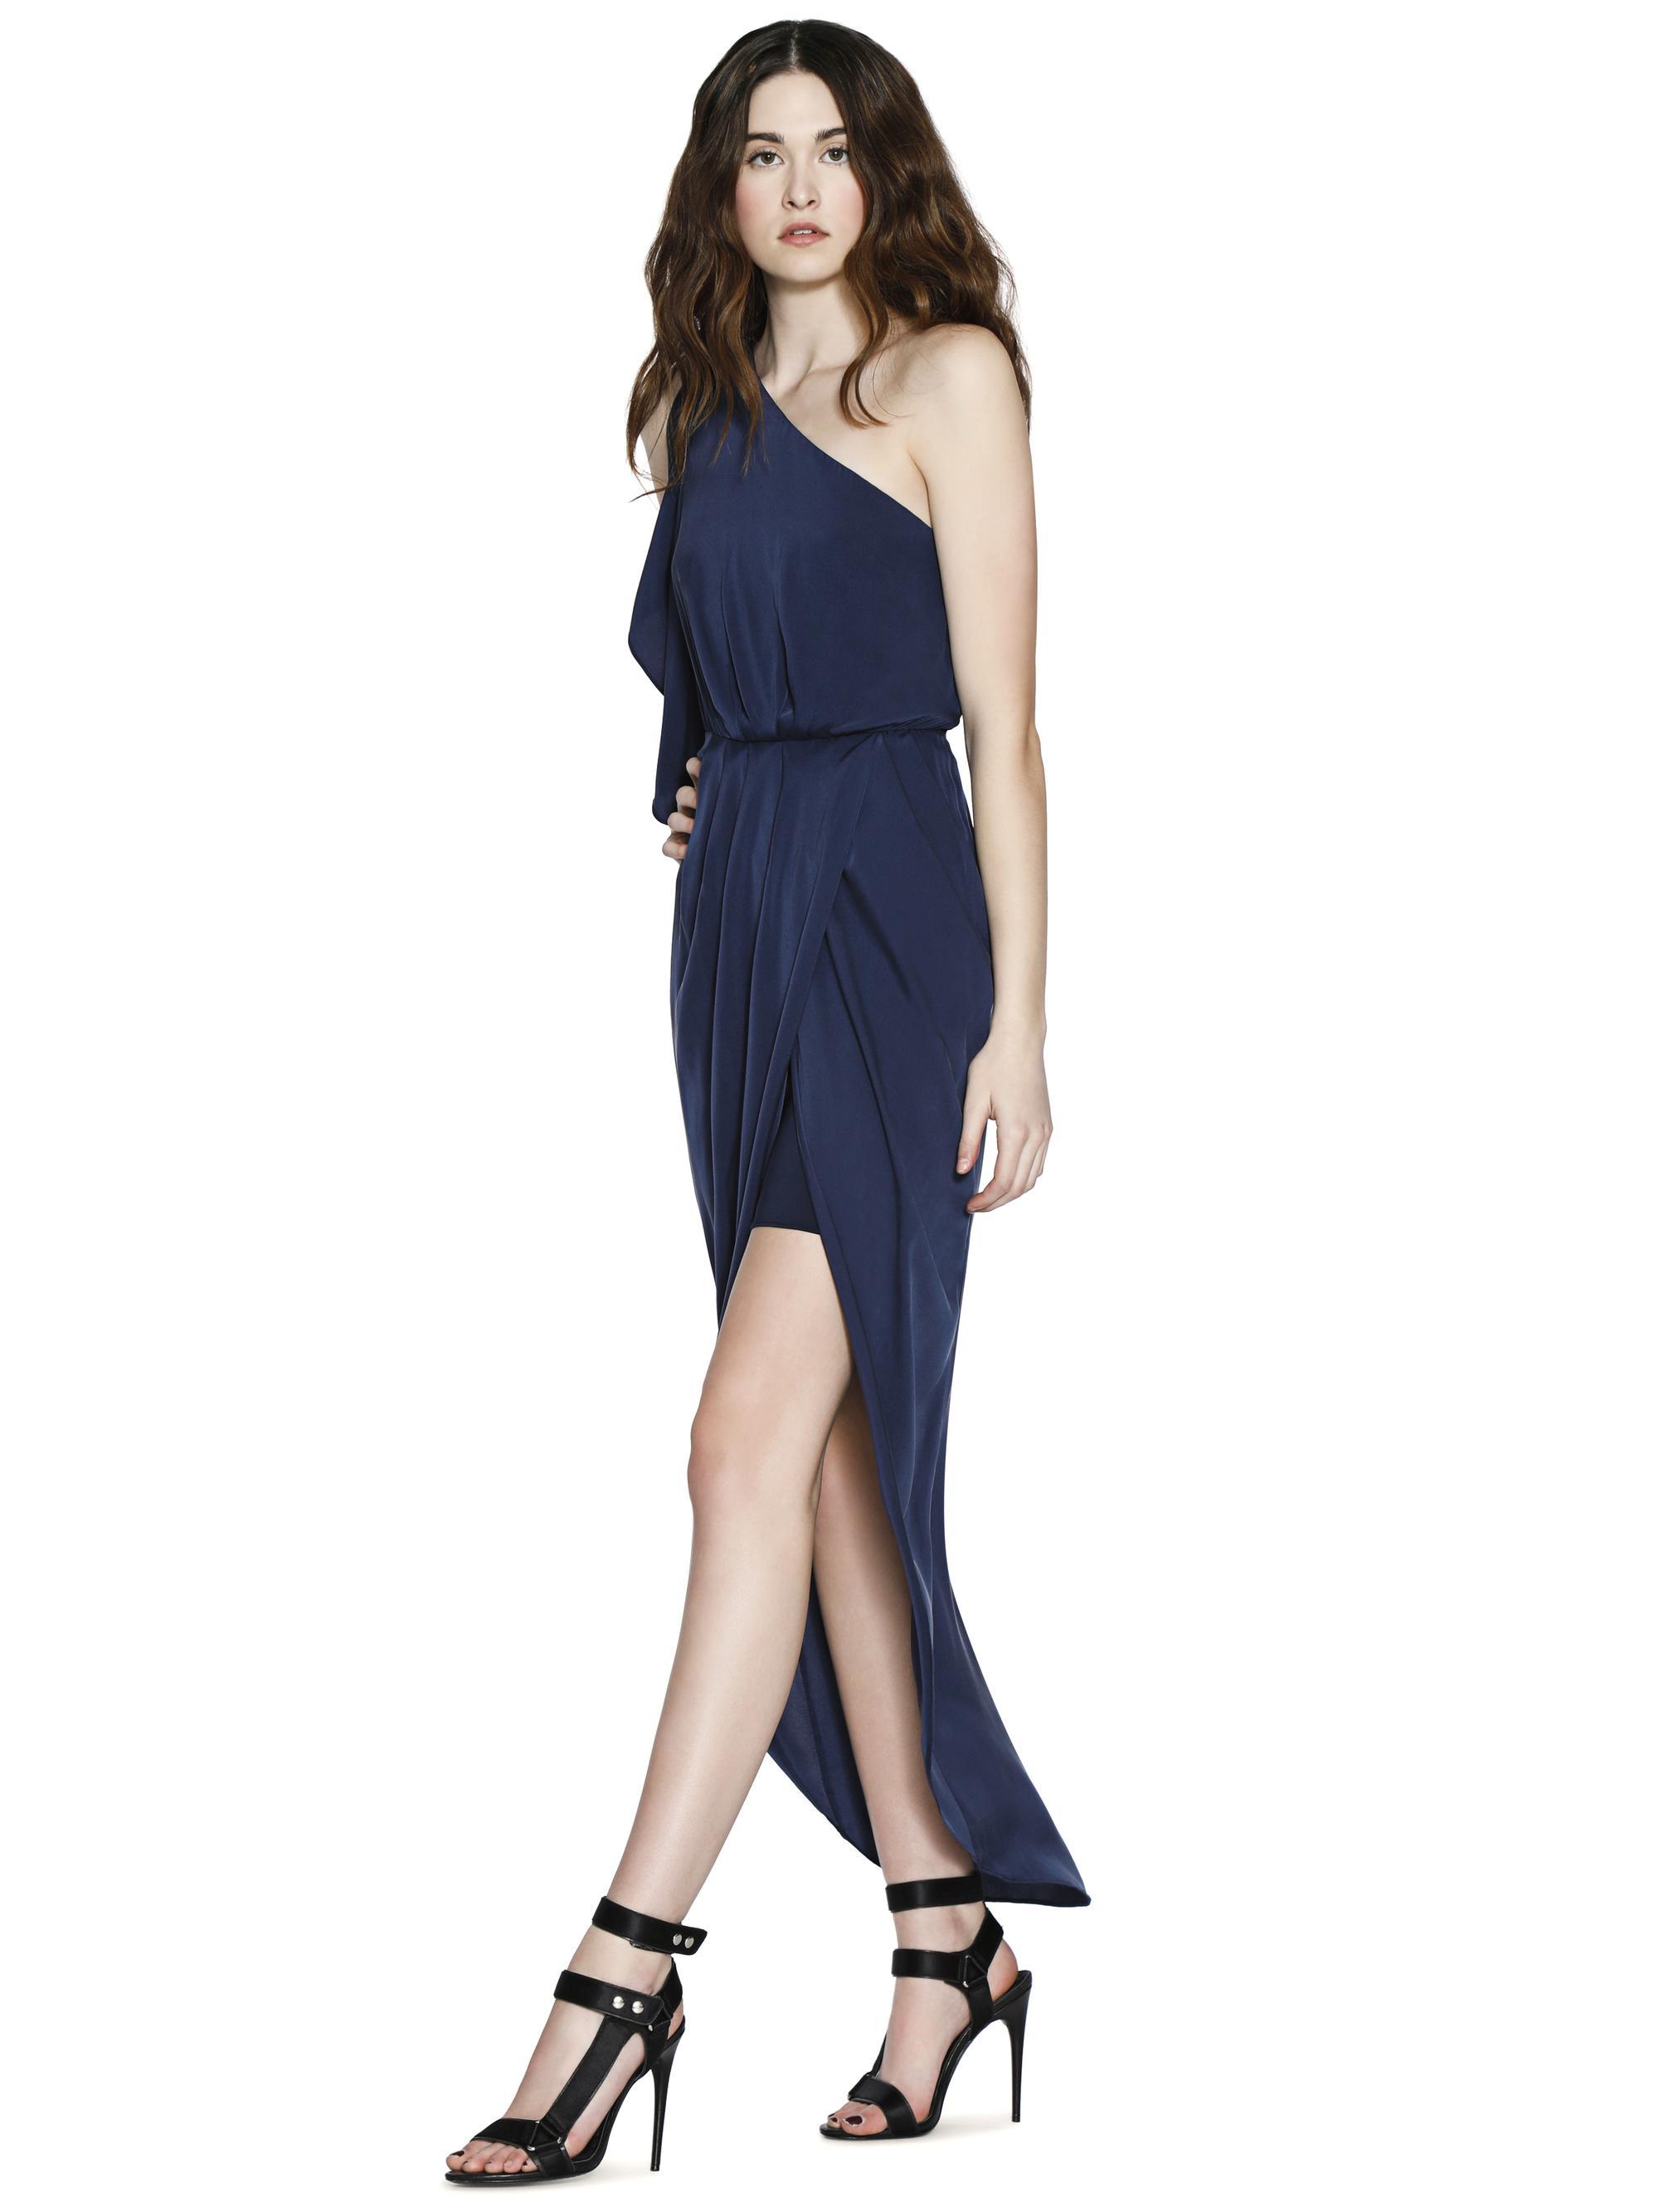 b6ffb4c23c6 Alice + Olivia Oleta One Shoulder Maxi Dress in Blue - Lyst